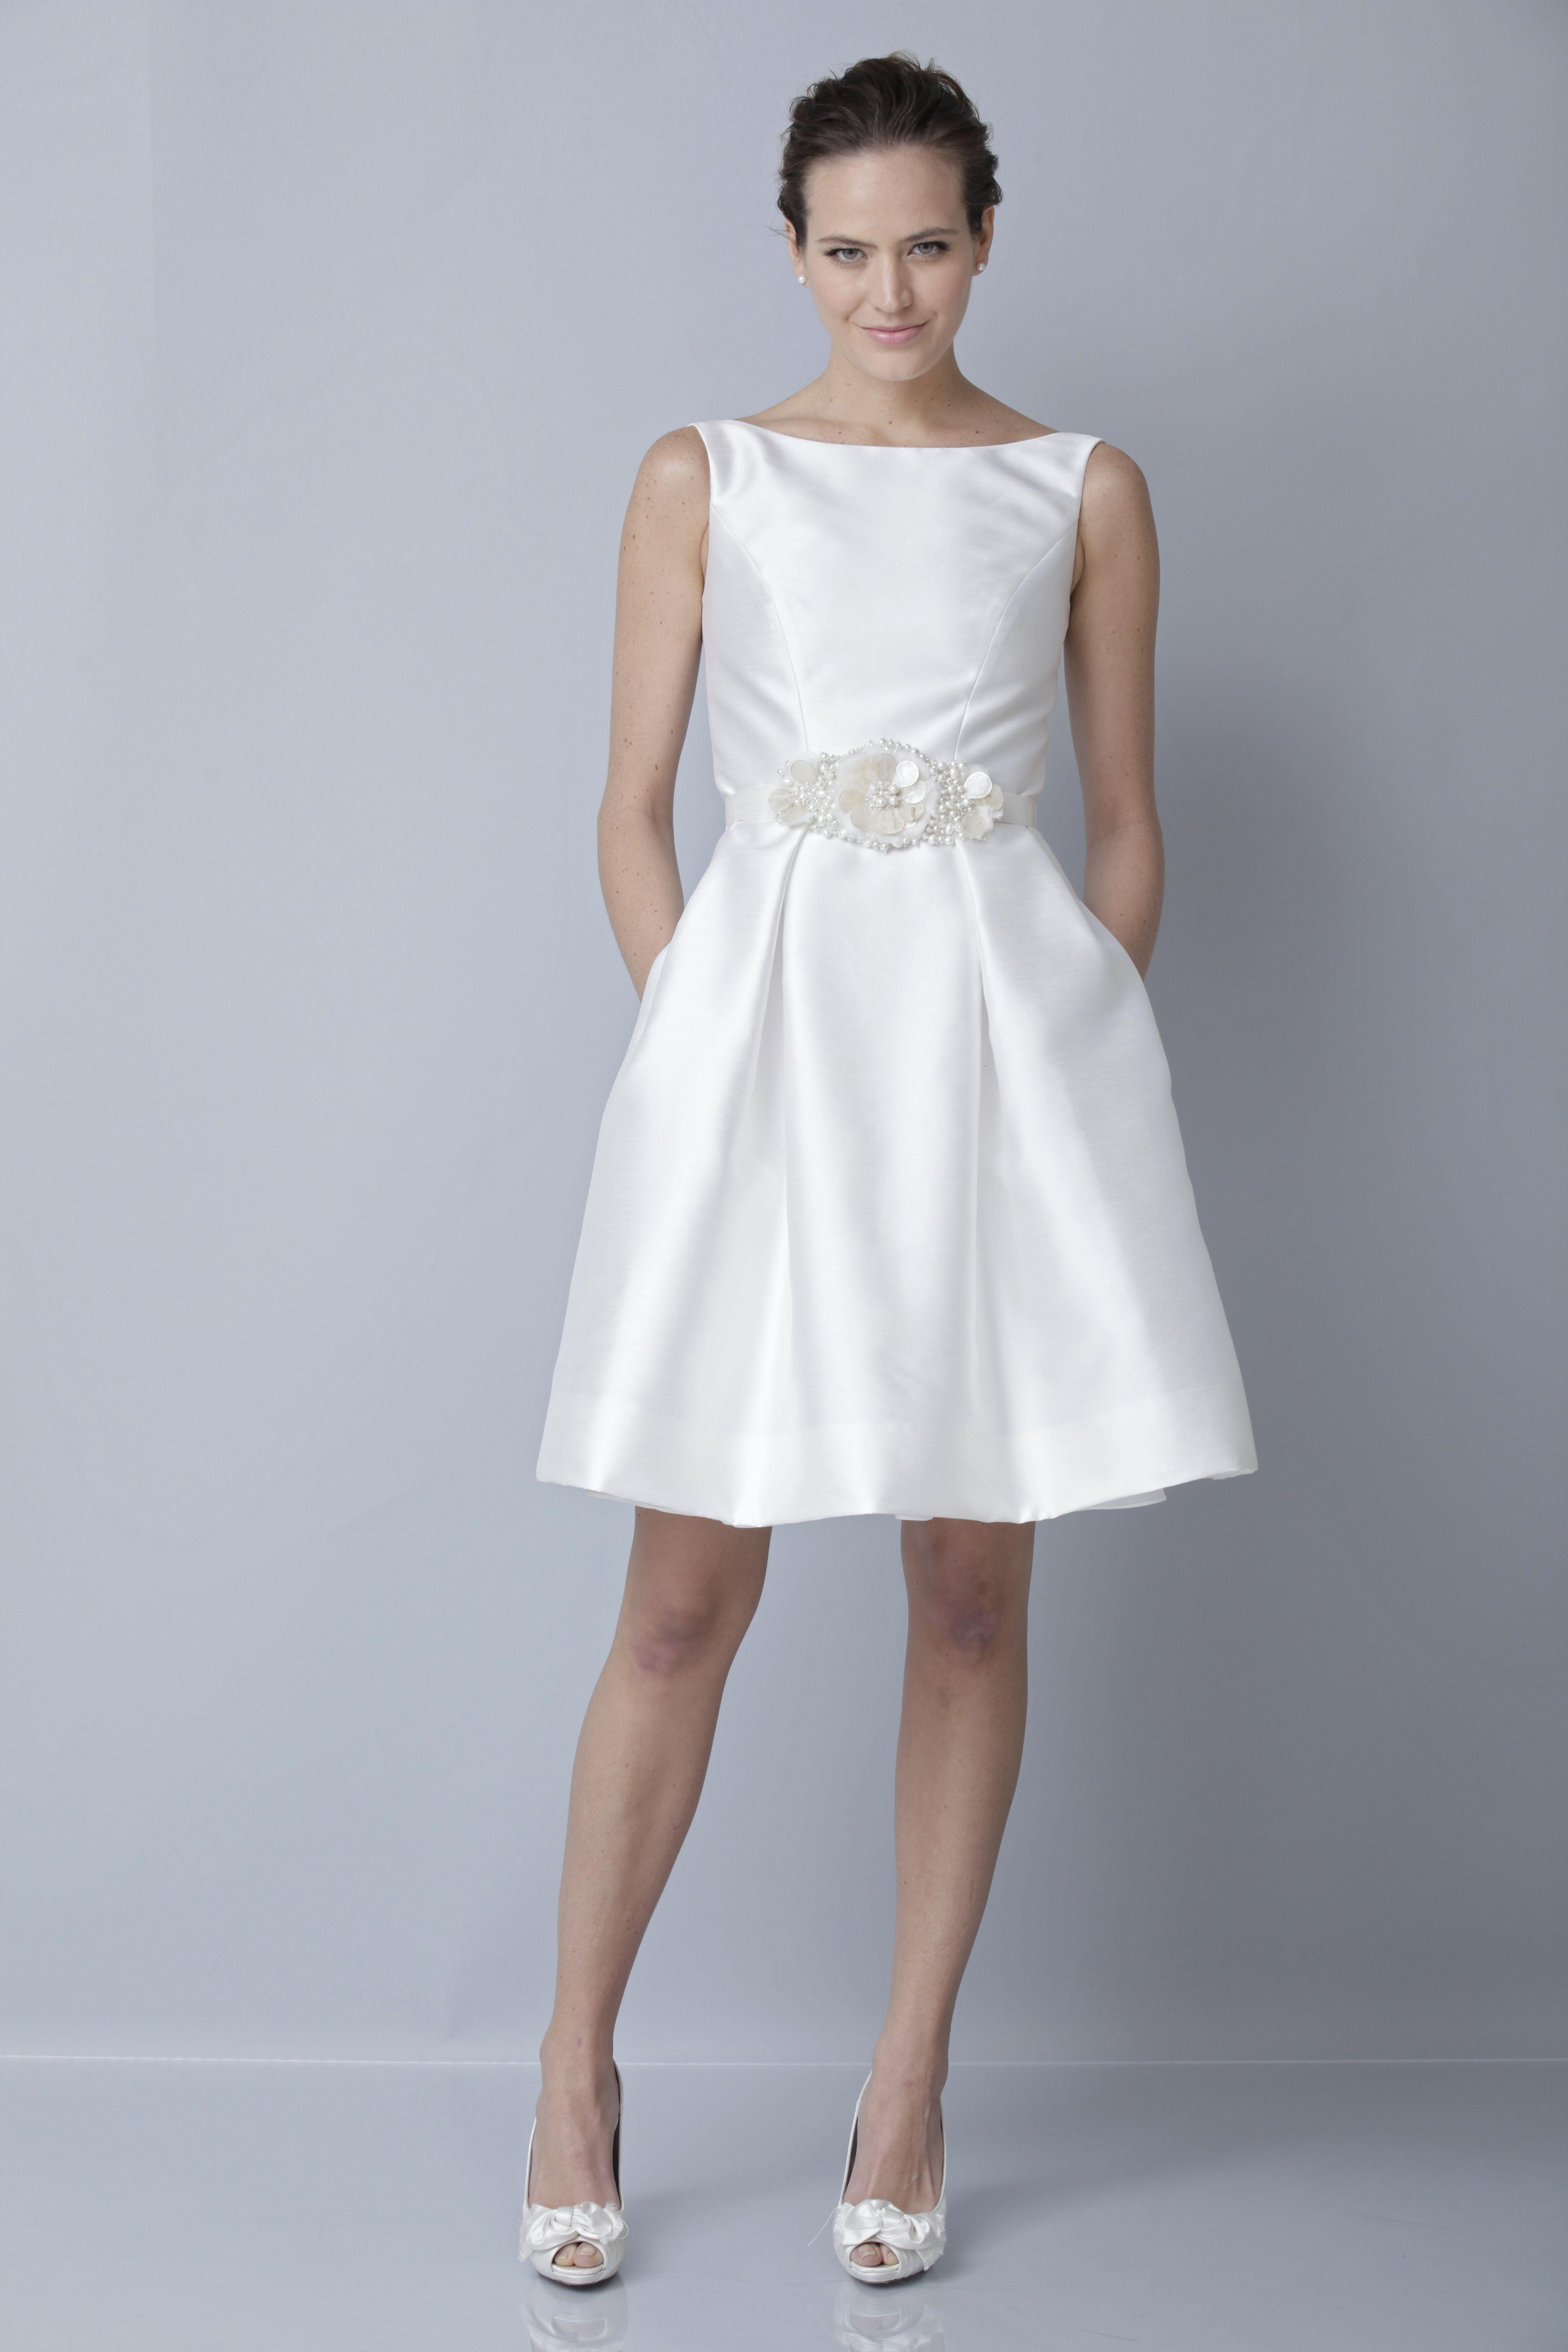 theia white collection wedding dress spring 2013 bridal gown 890010 ...